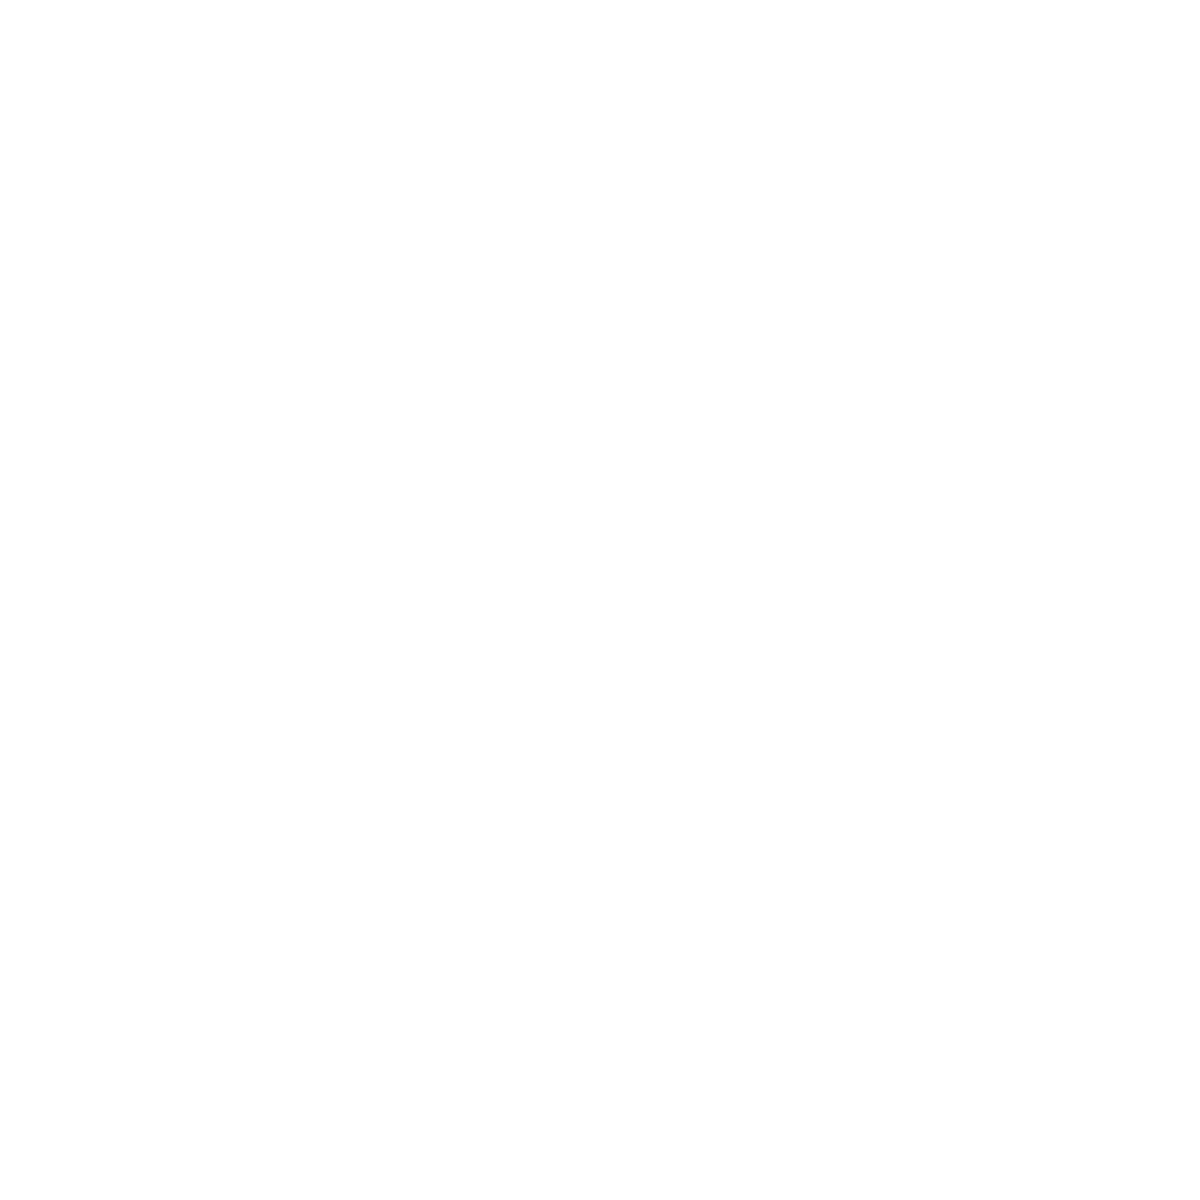 Cranfiled University